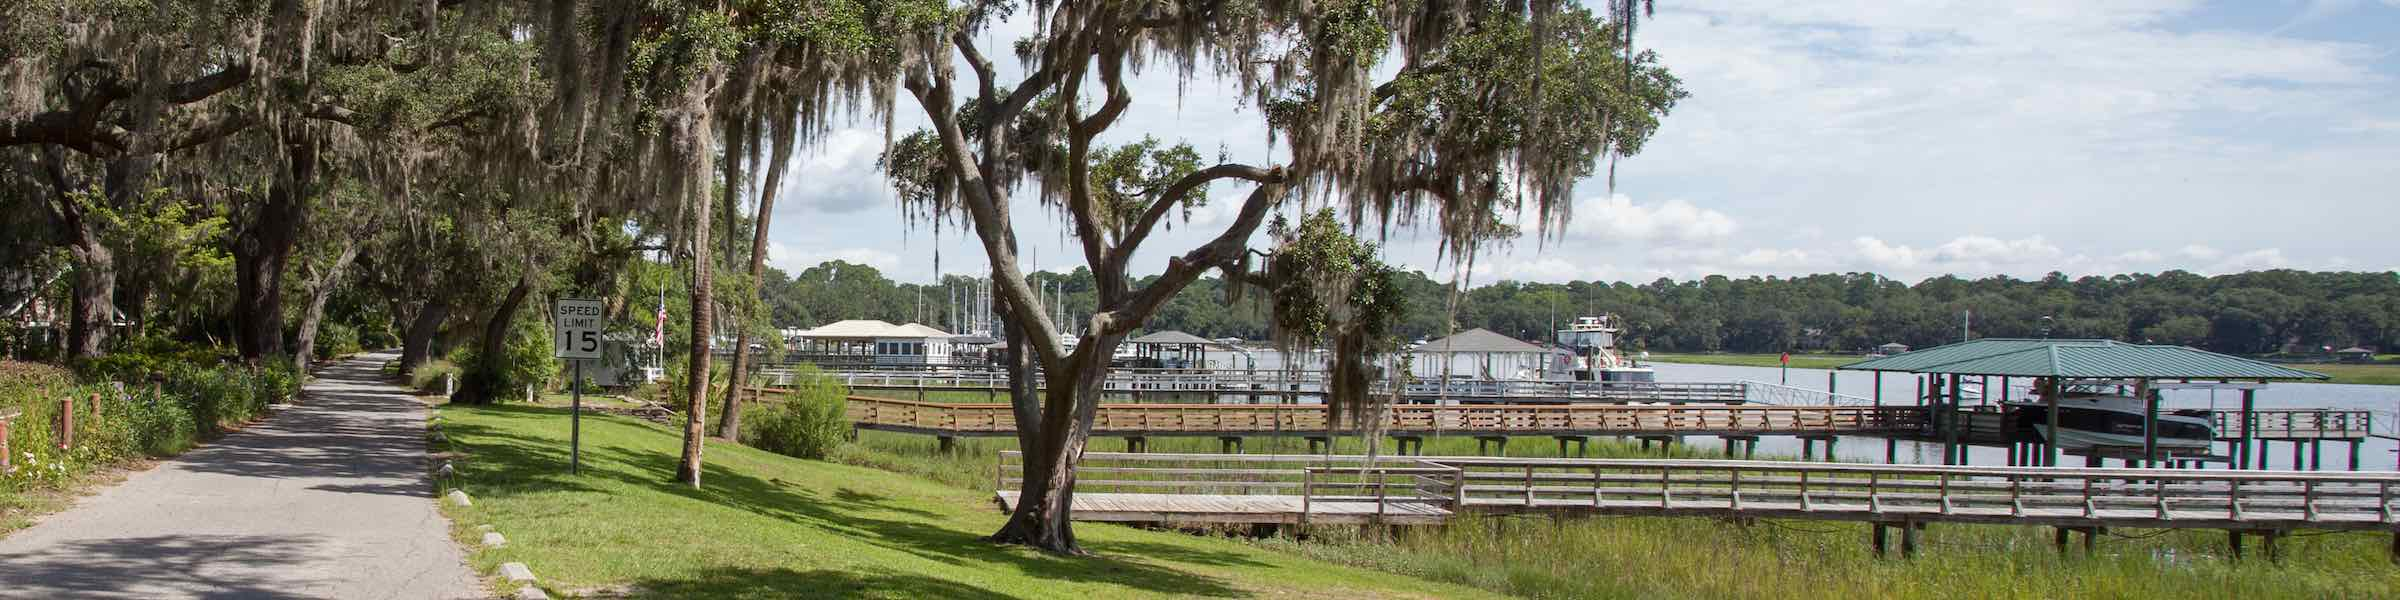 Bluff Drive, Isle of Hope, near Savannah, GA.